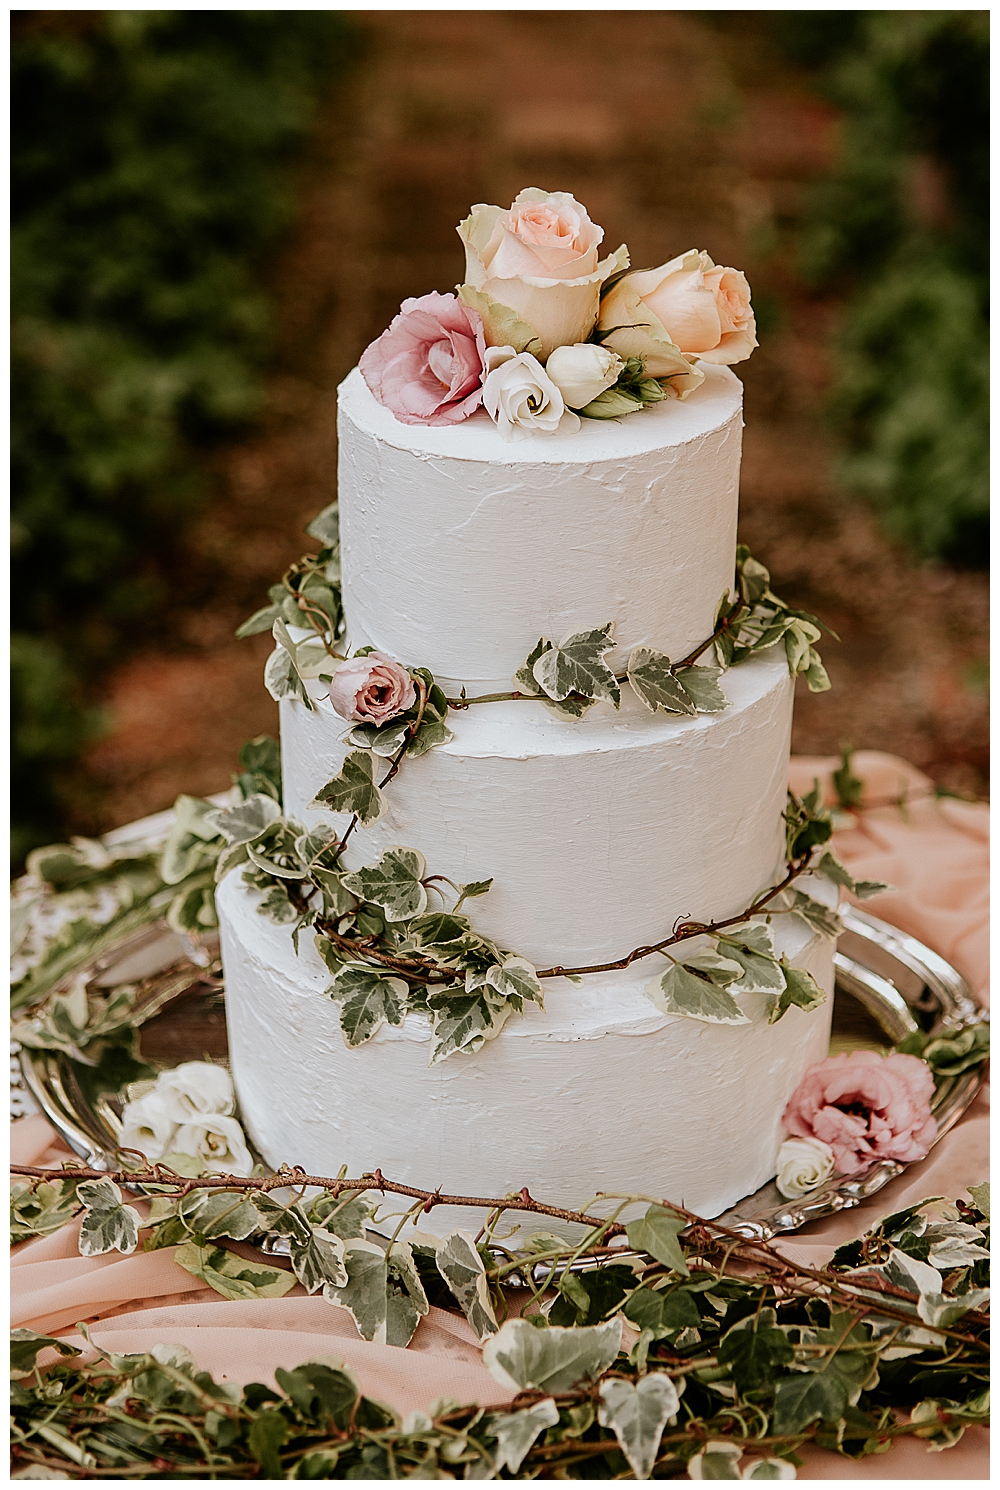 white-buttercream-wedding-cake-with-flowers